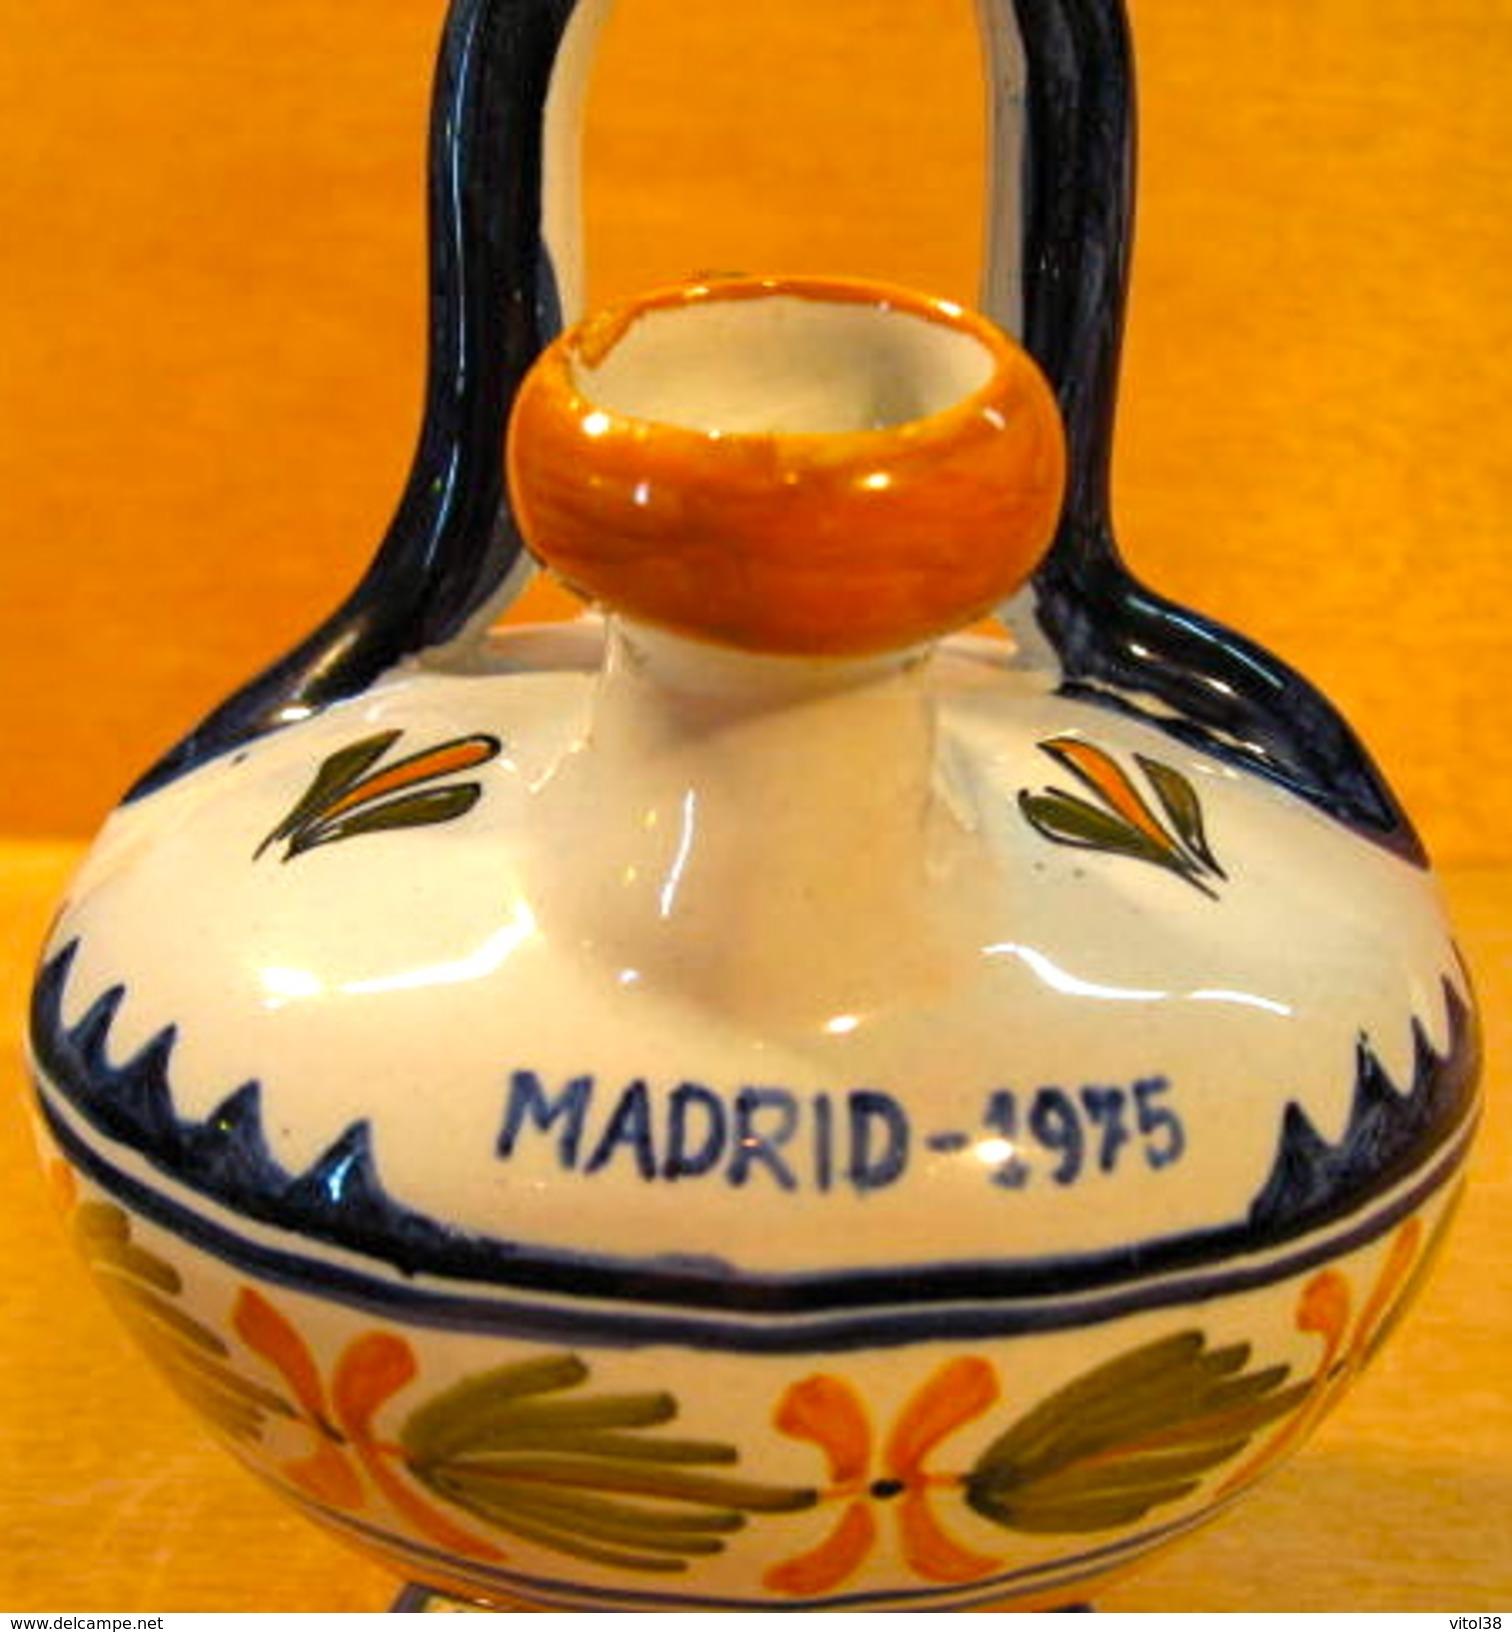 III SIMPOSIUM YOPLAIT INTERNACIONAL MADRID 1975 /  ESPANA N° 5 - Autres Bouteilles